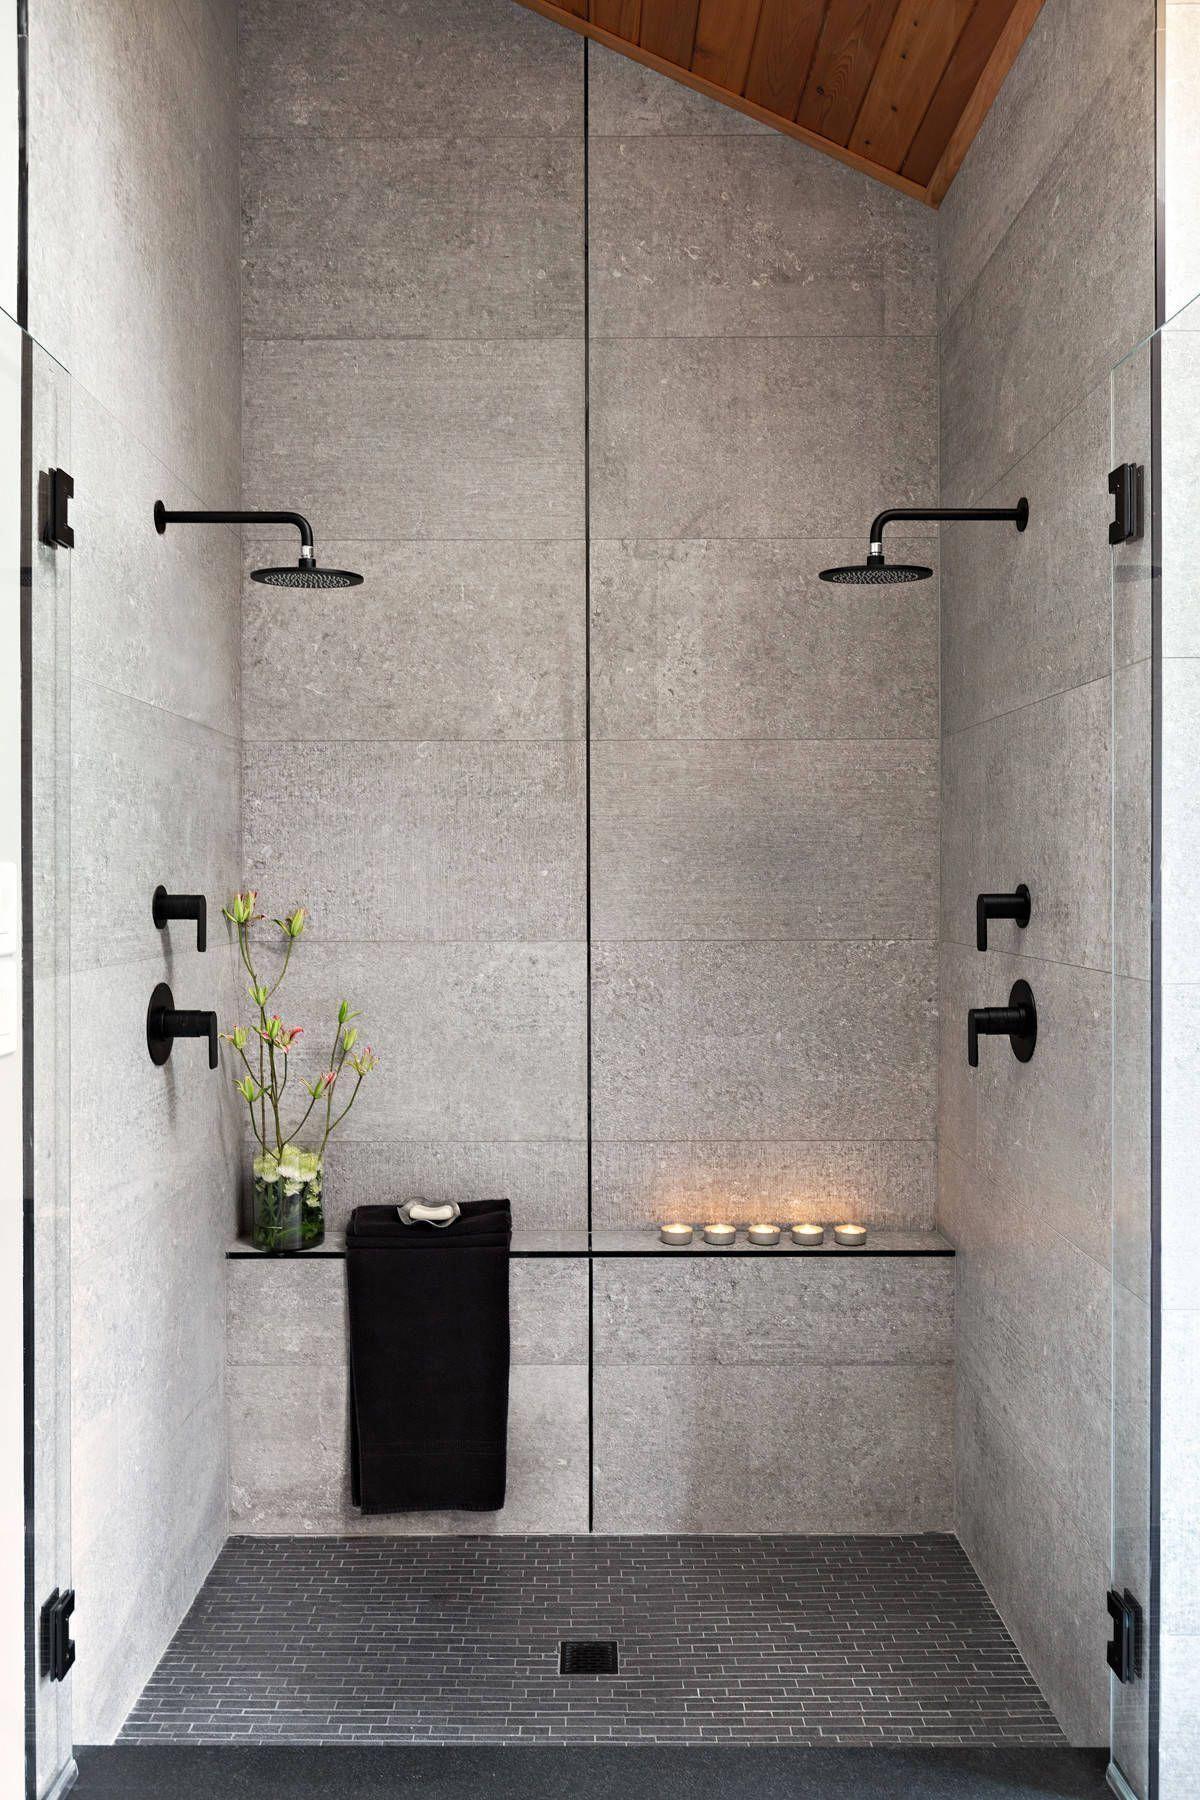 Pin By Janna Van Den Munckhof On Accesoires In 2020 Spa Bathroom